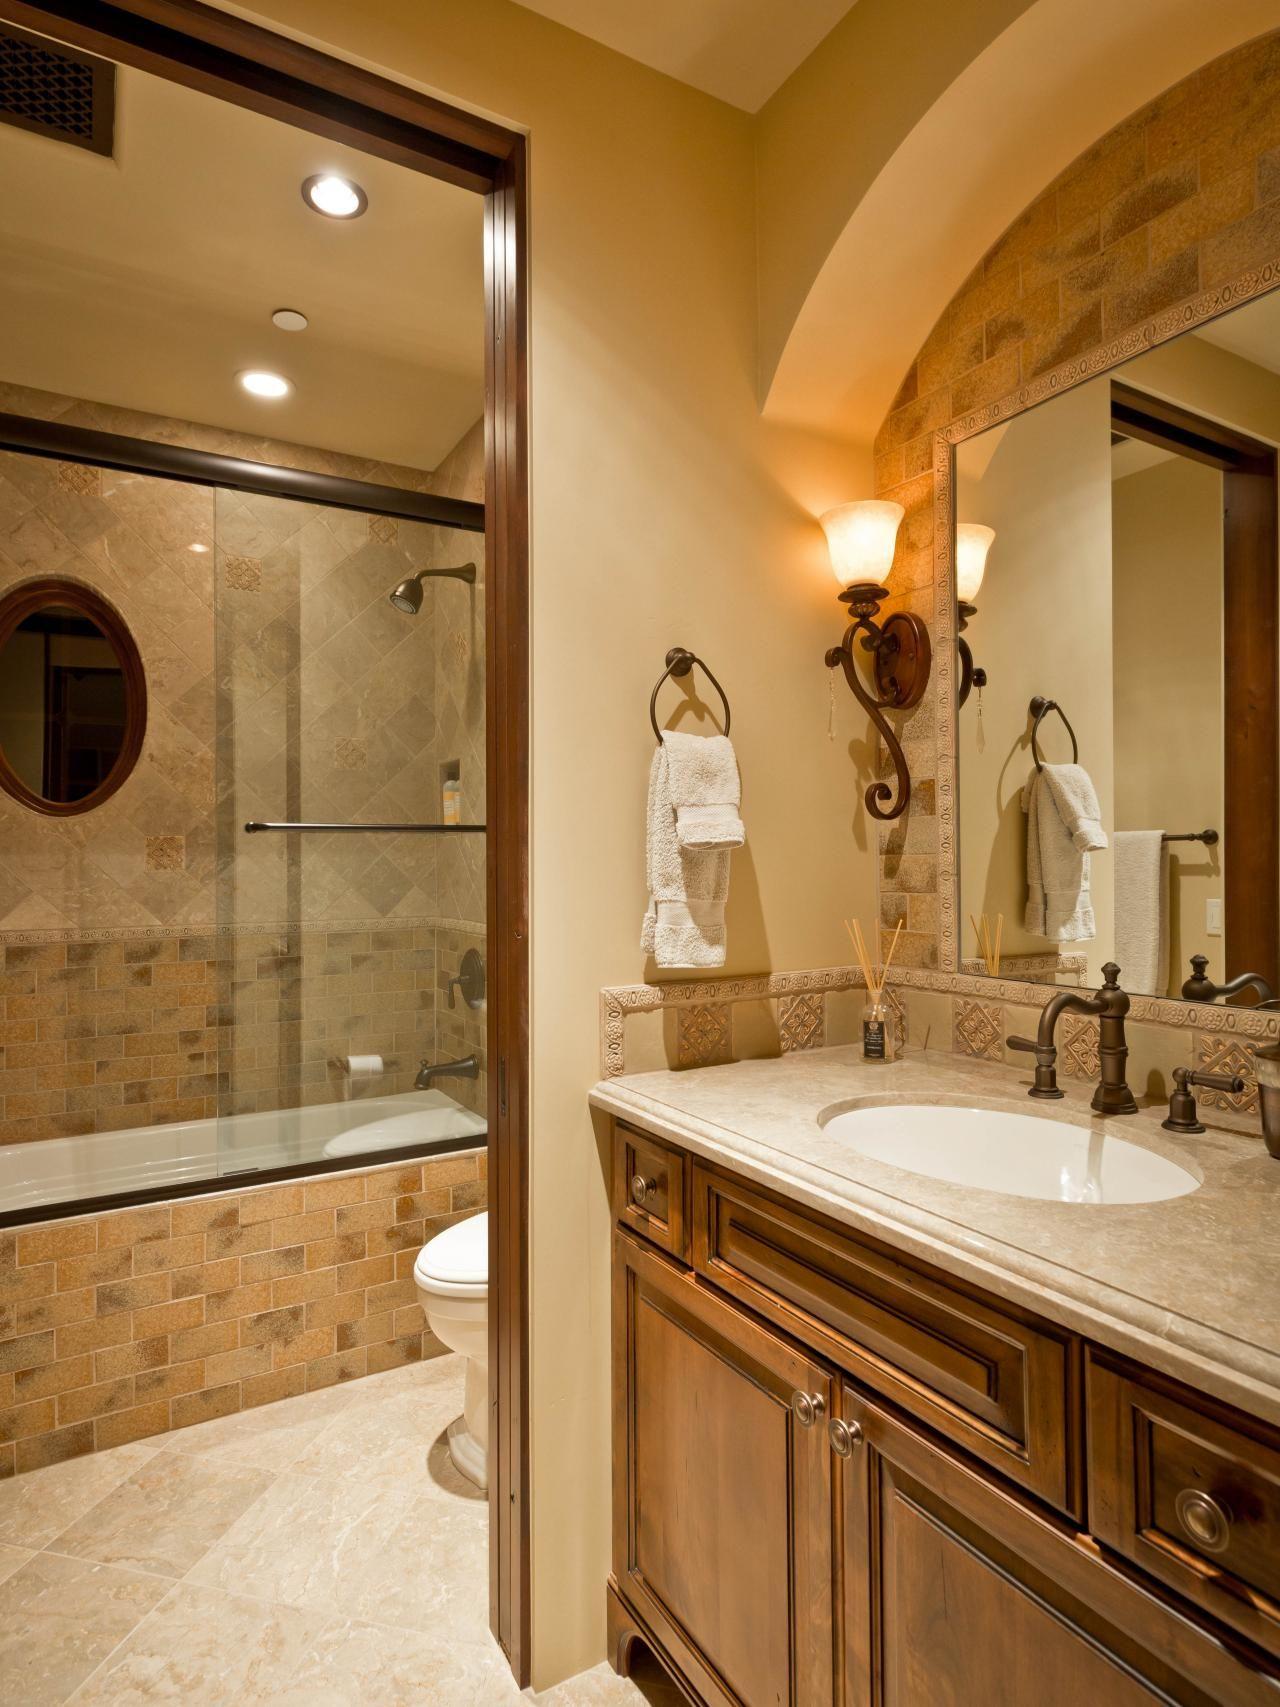 Mediterranean Bathroom Design Amusing A Mediterranean Bathroom Is Decorated In A Warm Neutral Palette Decorating Design